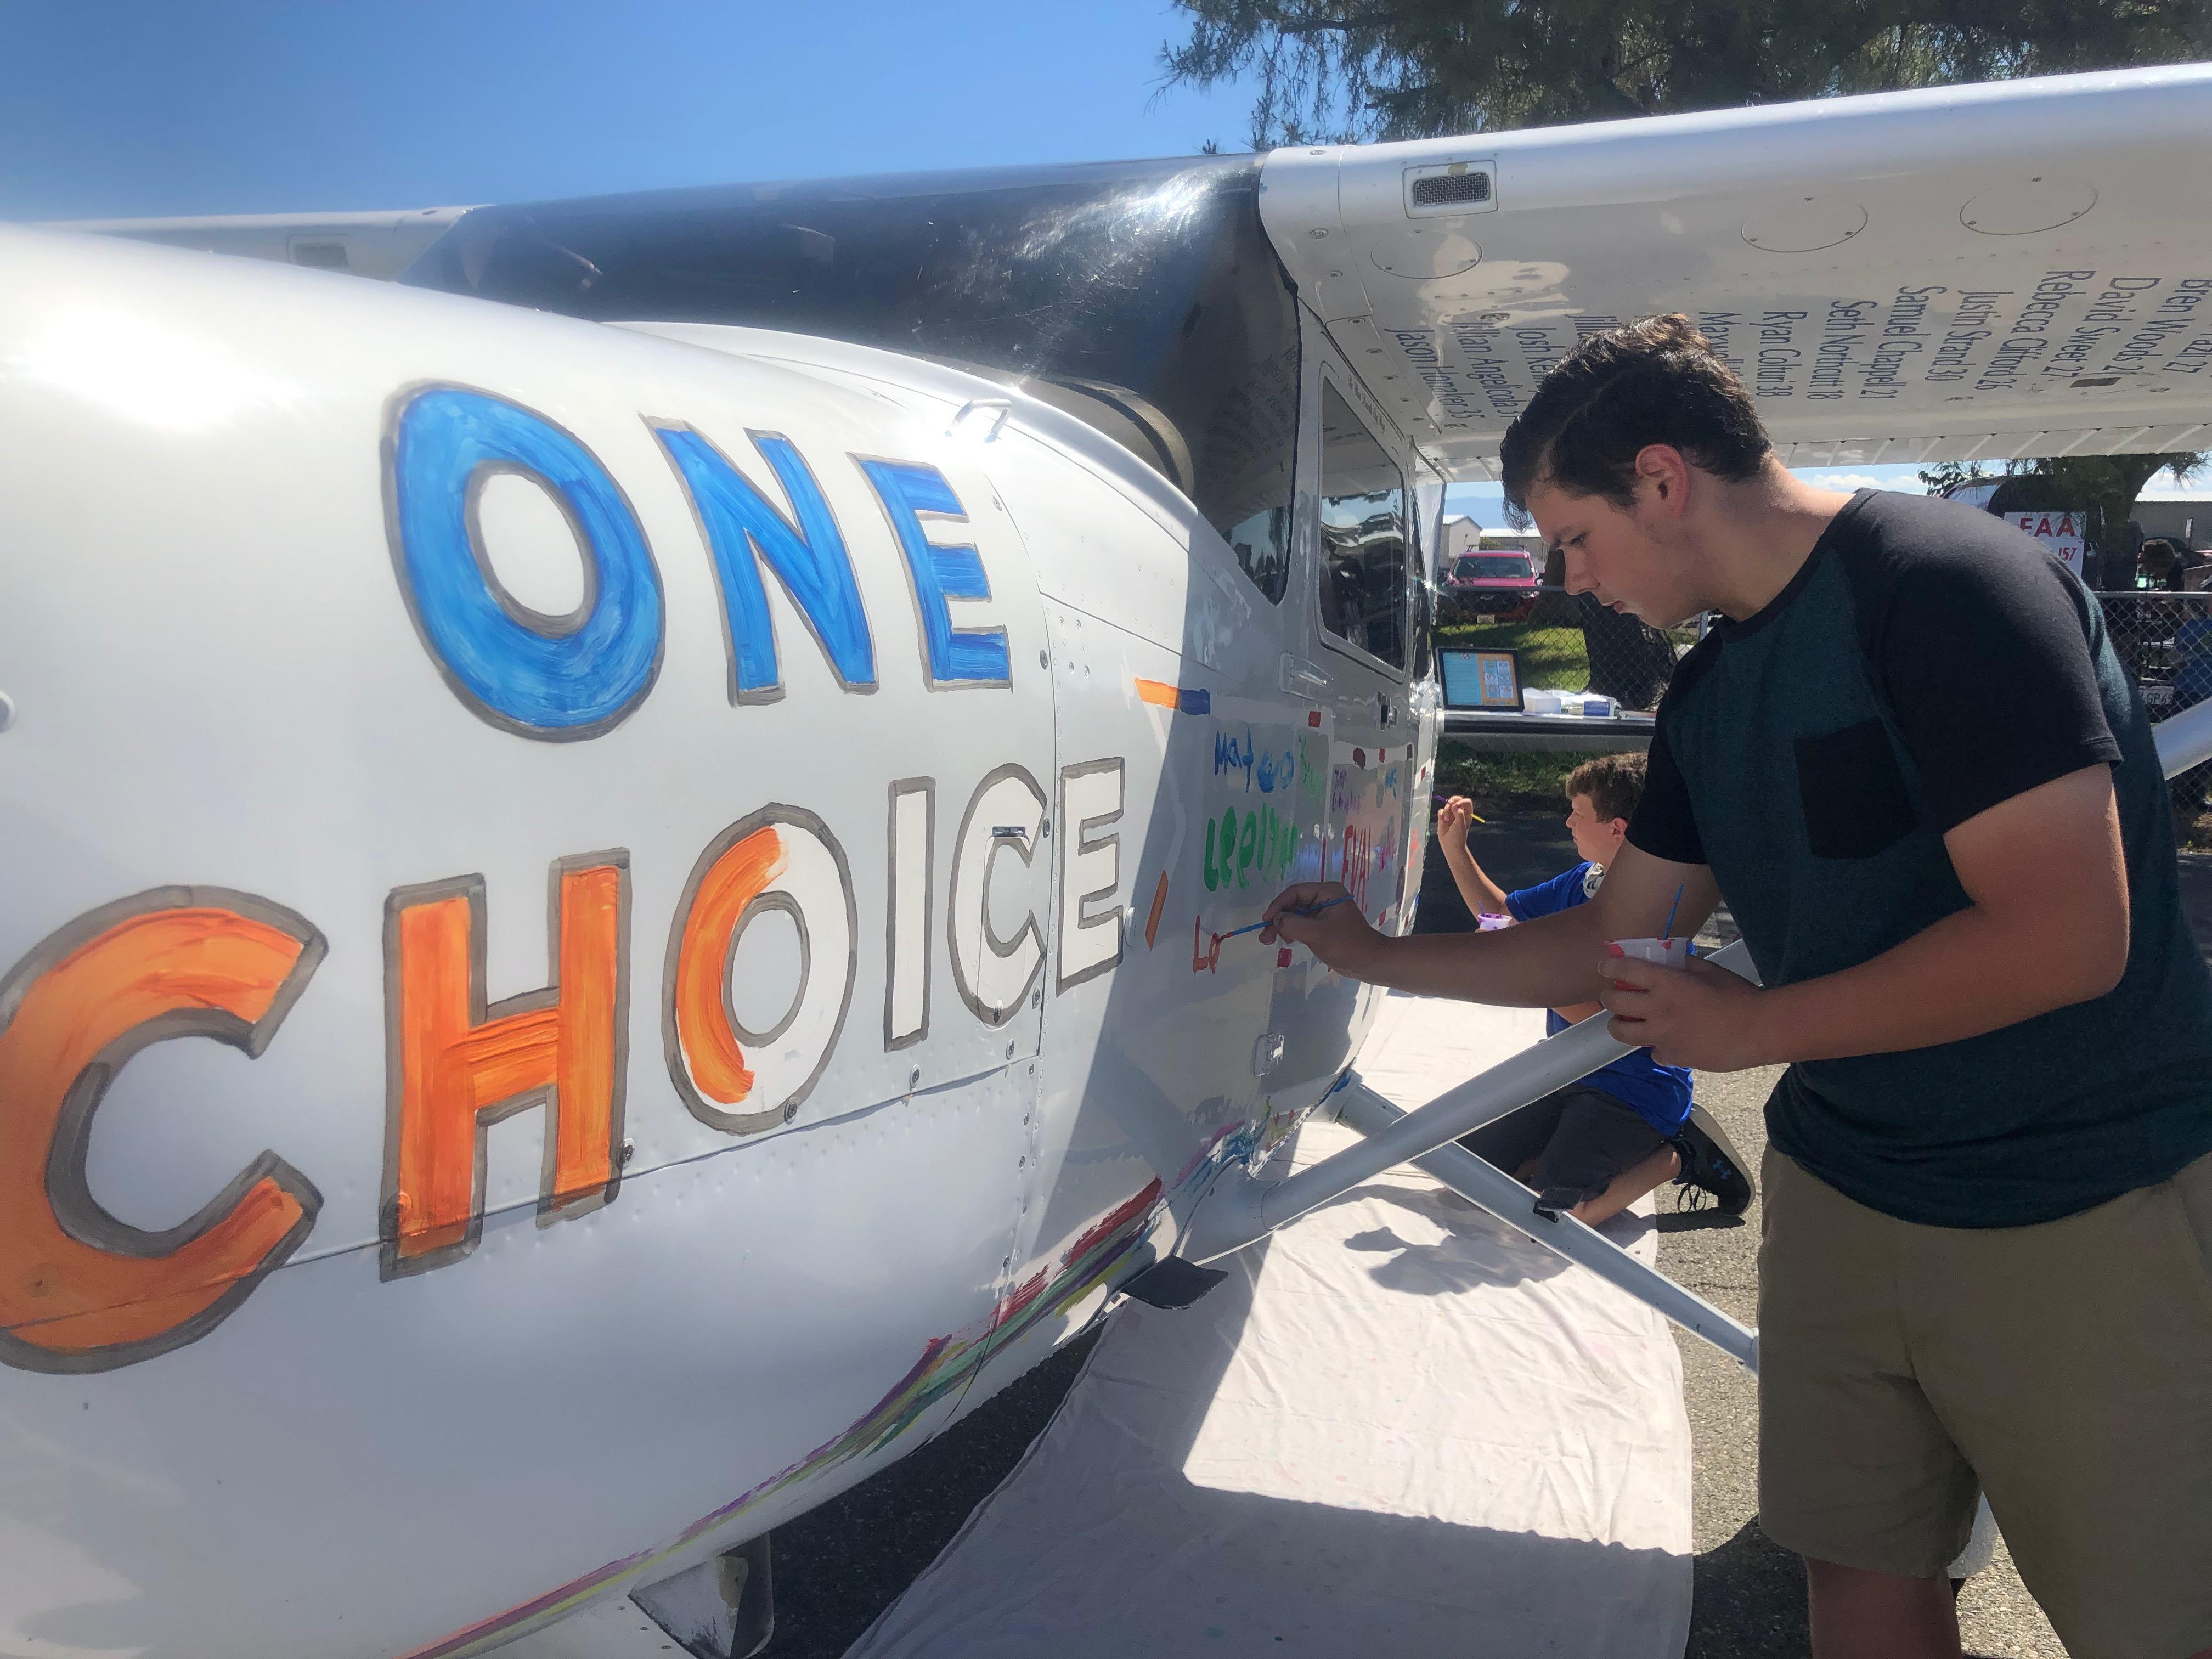 Taking the One Choice Pledge